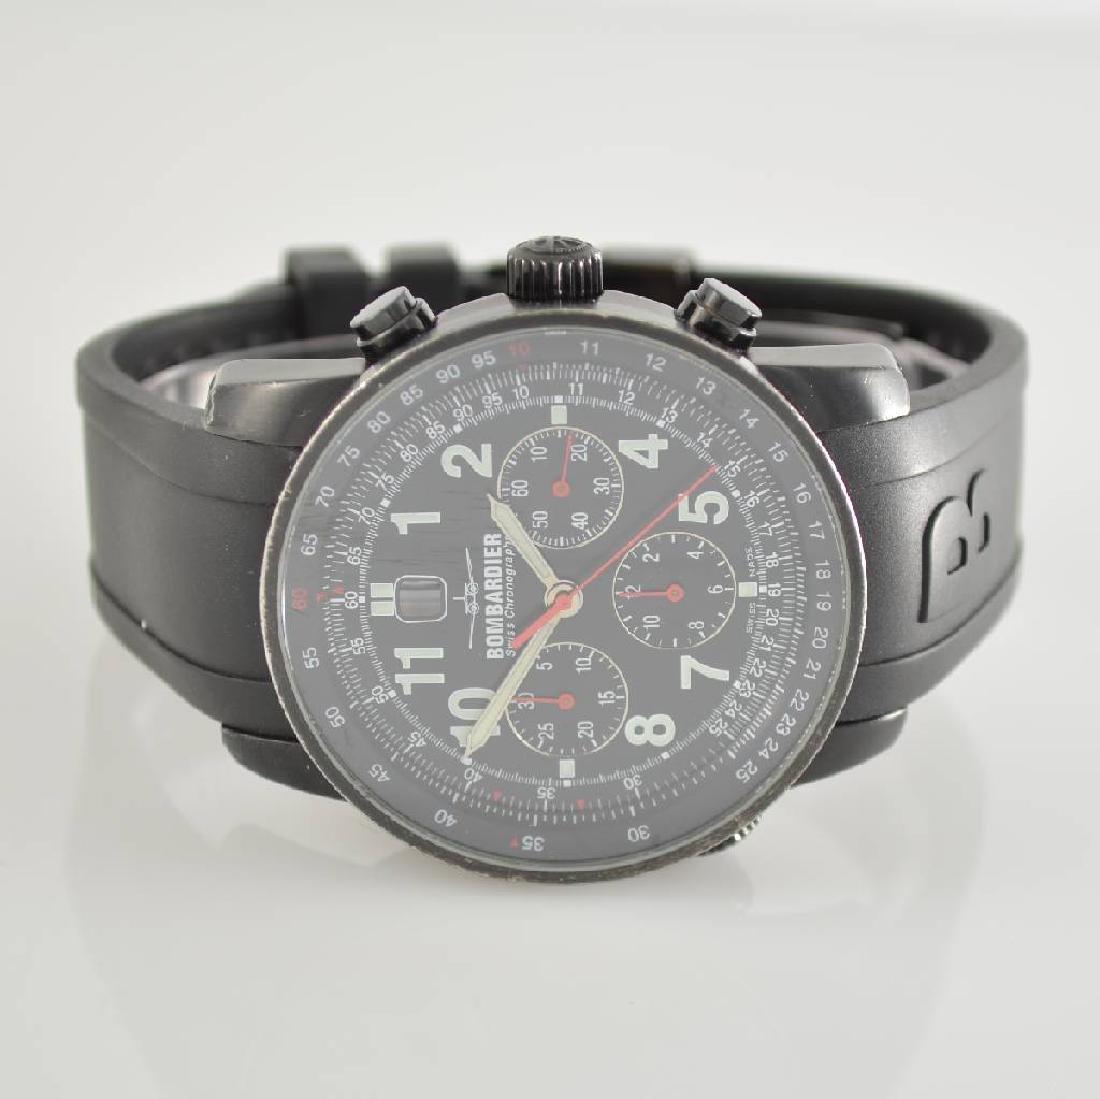 BOMBARDIER big automatic chronograph